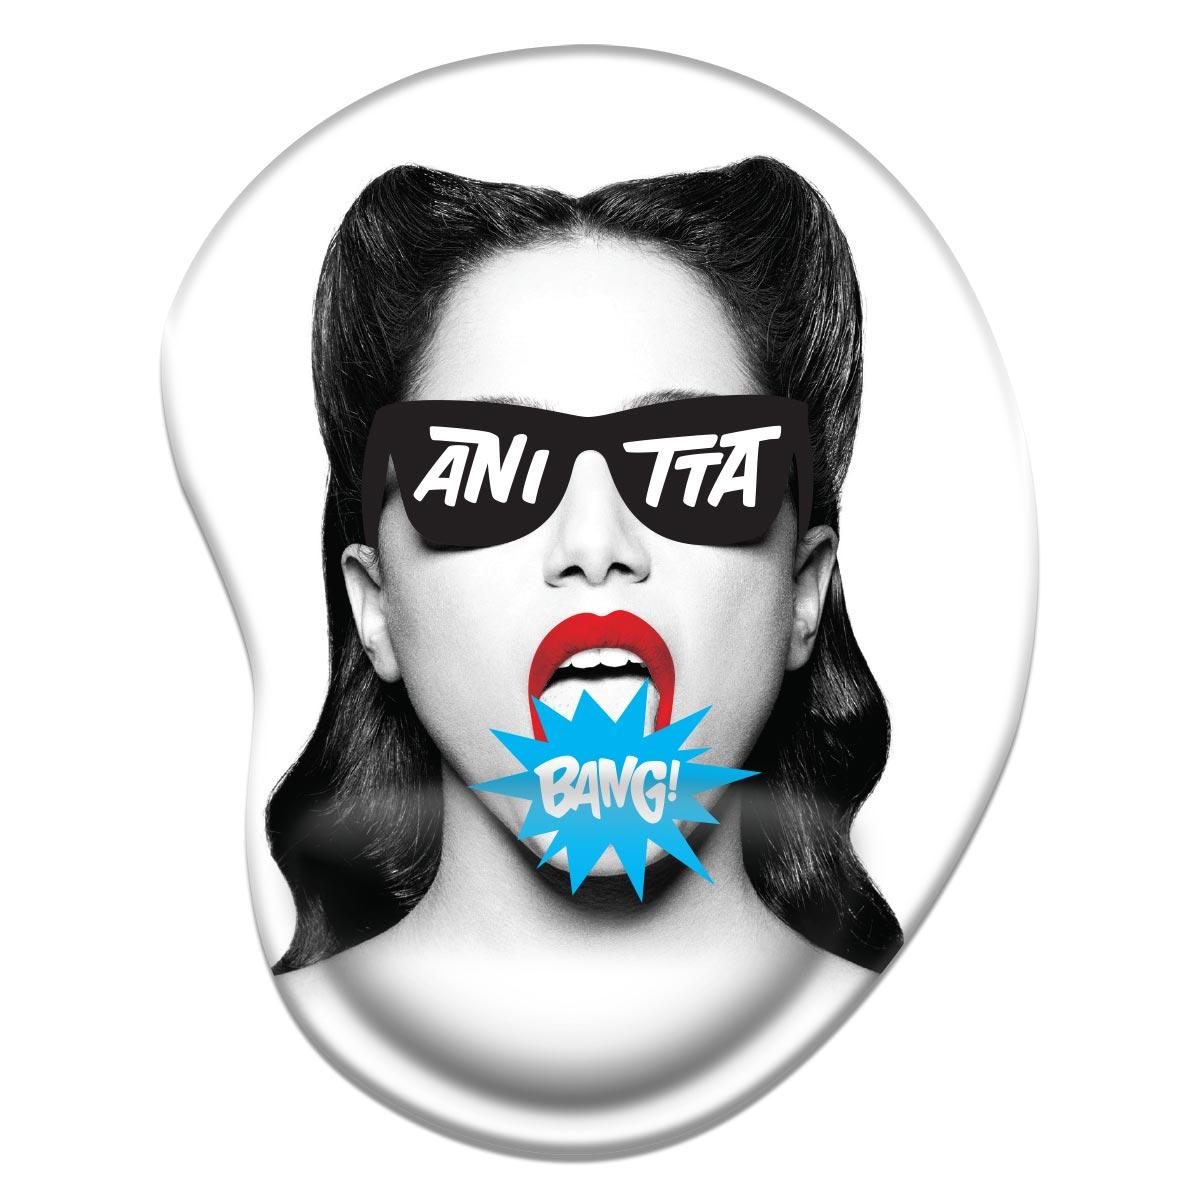 Mousepad Anitta Bang!